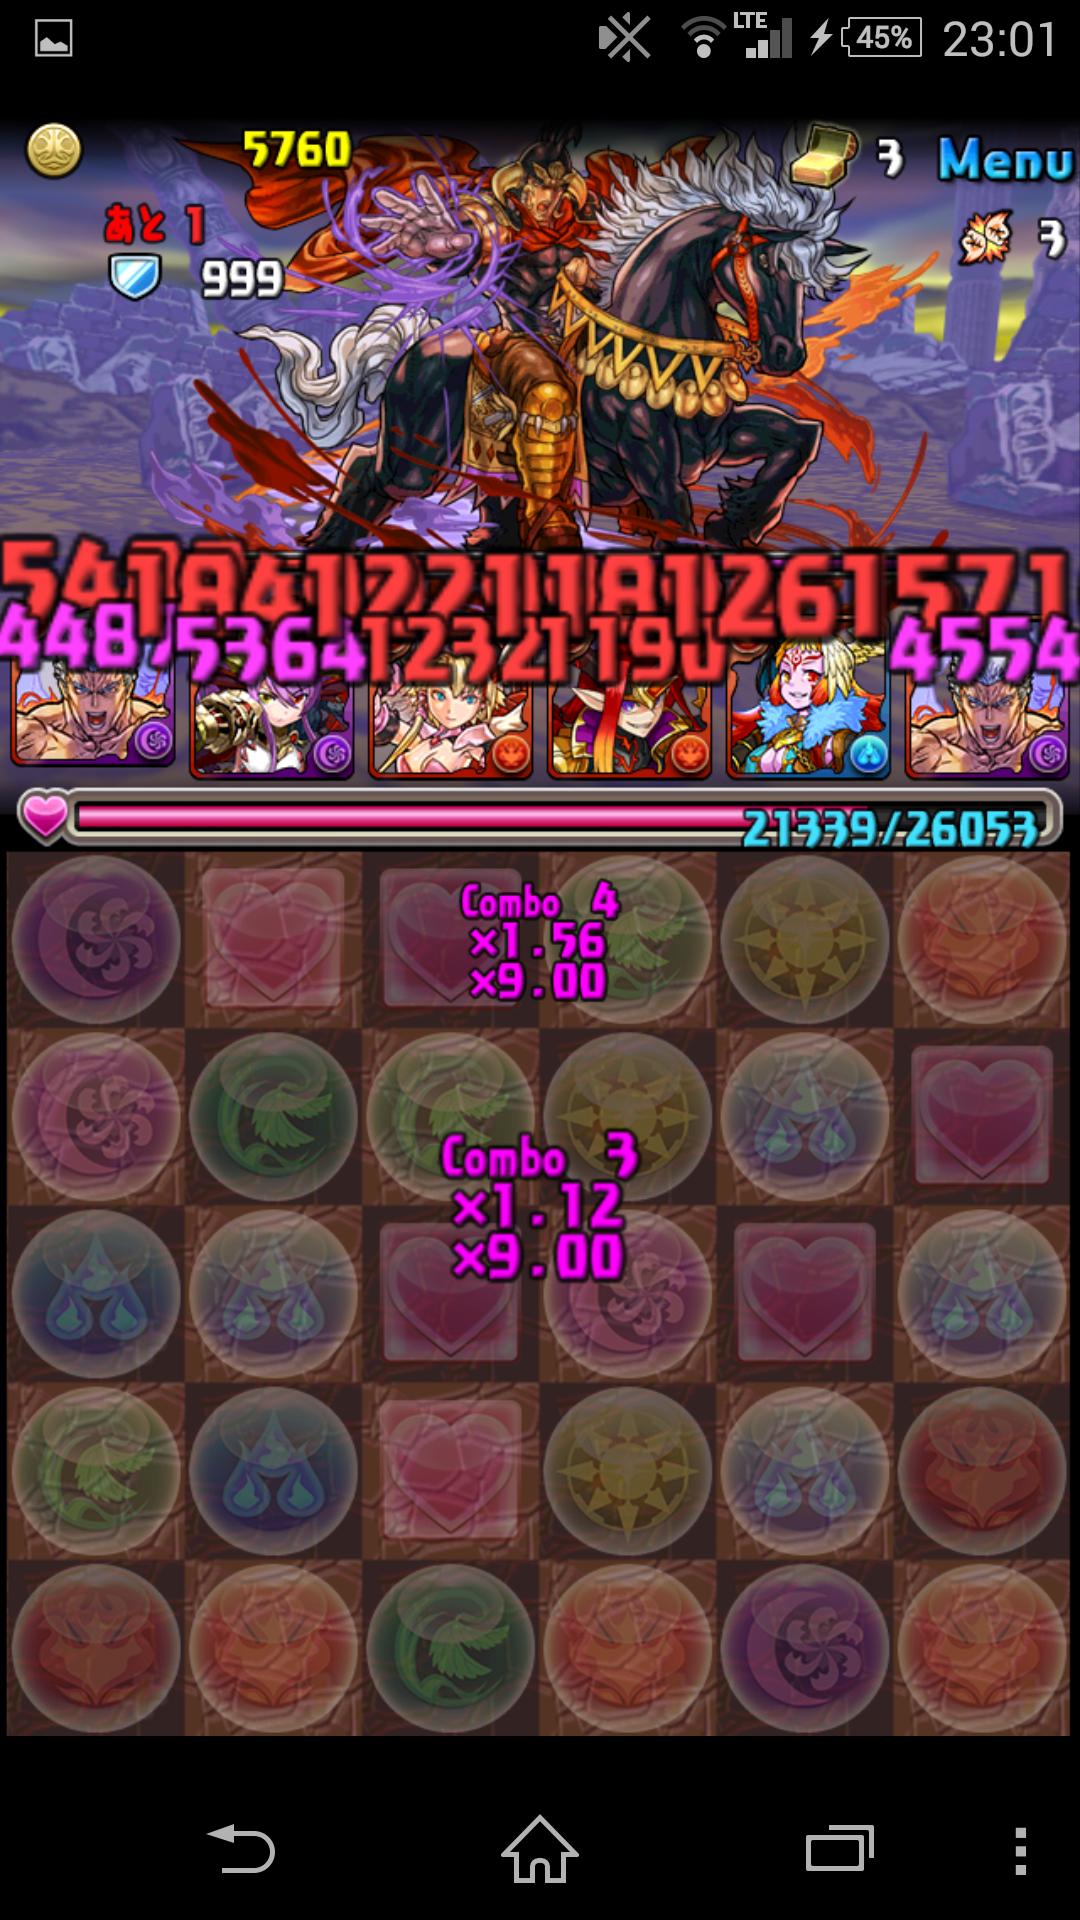 Screenshot_2015-02-07-23-01-12.png